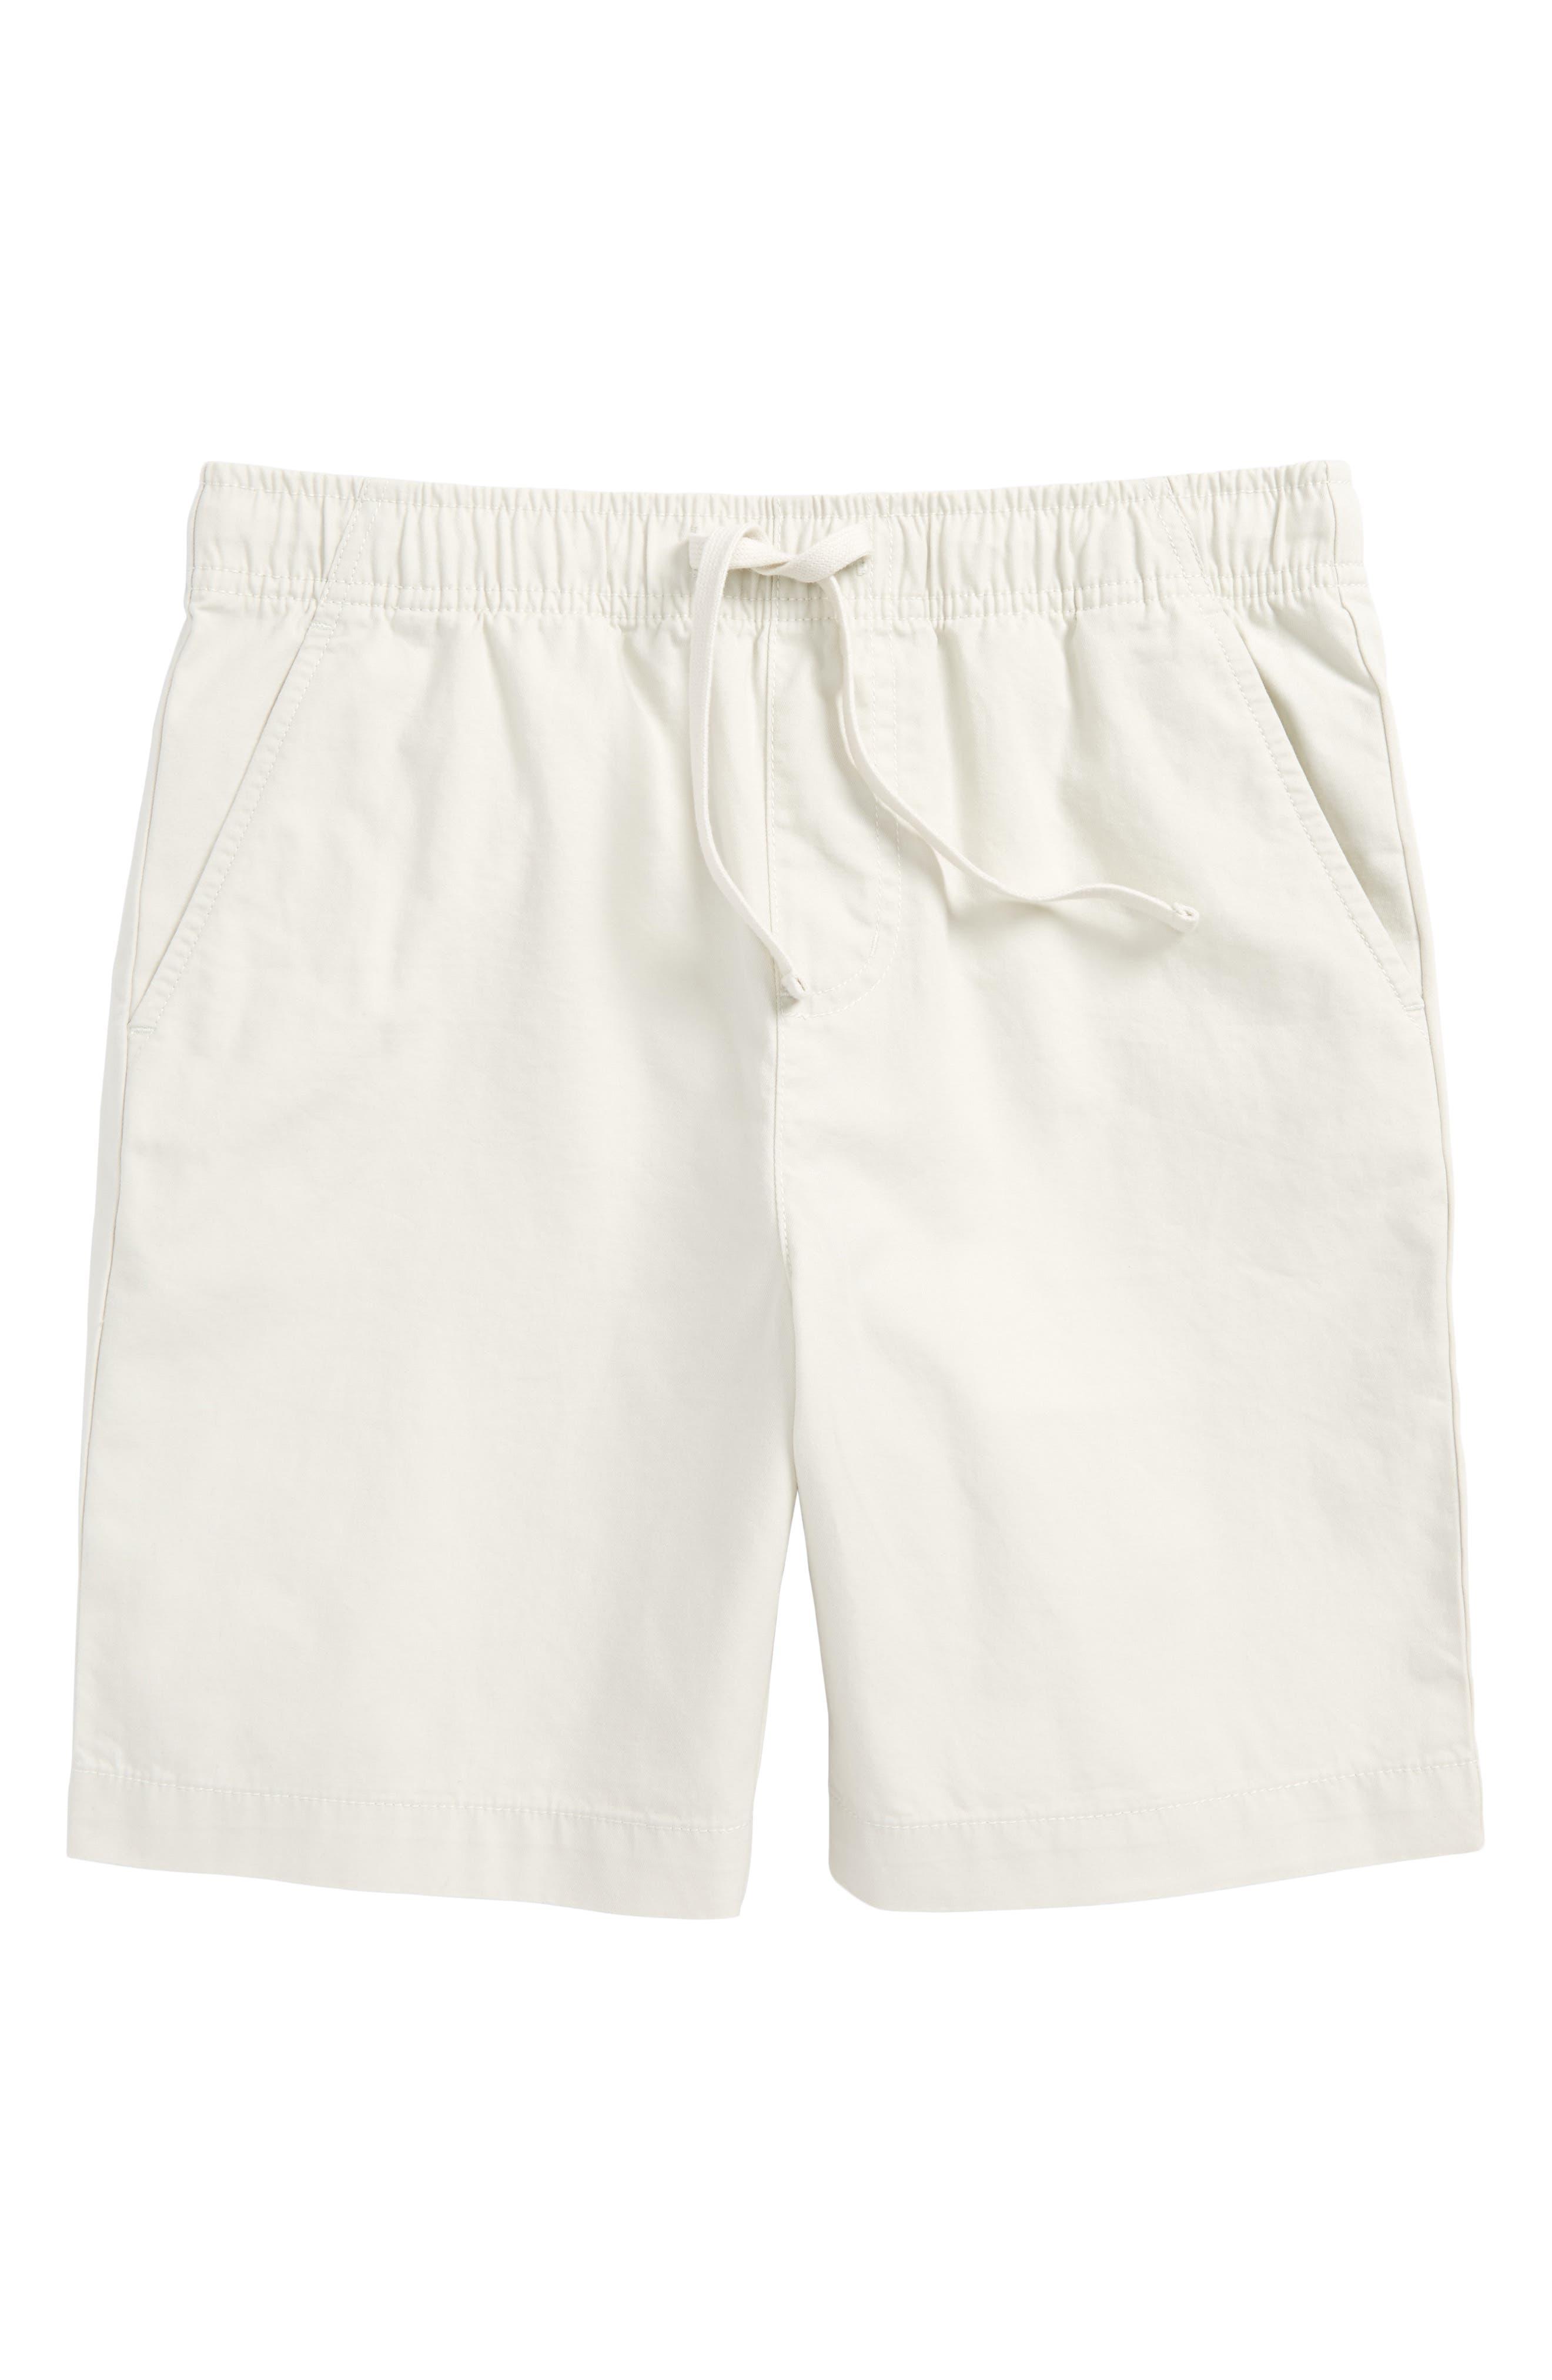 Elastic Waist Shorts,                         Main,                         color, 274